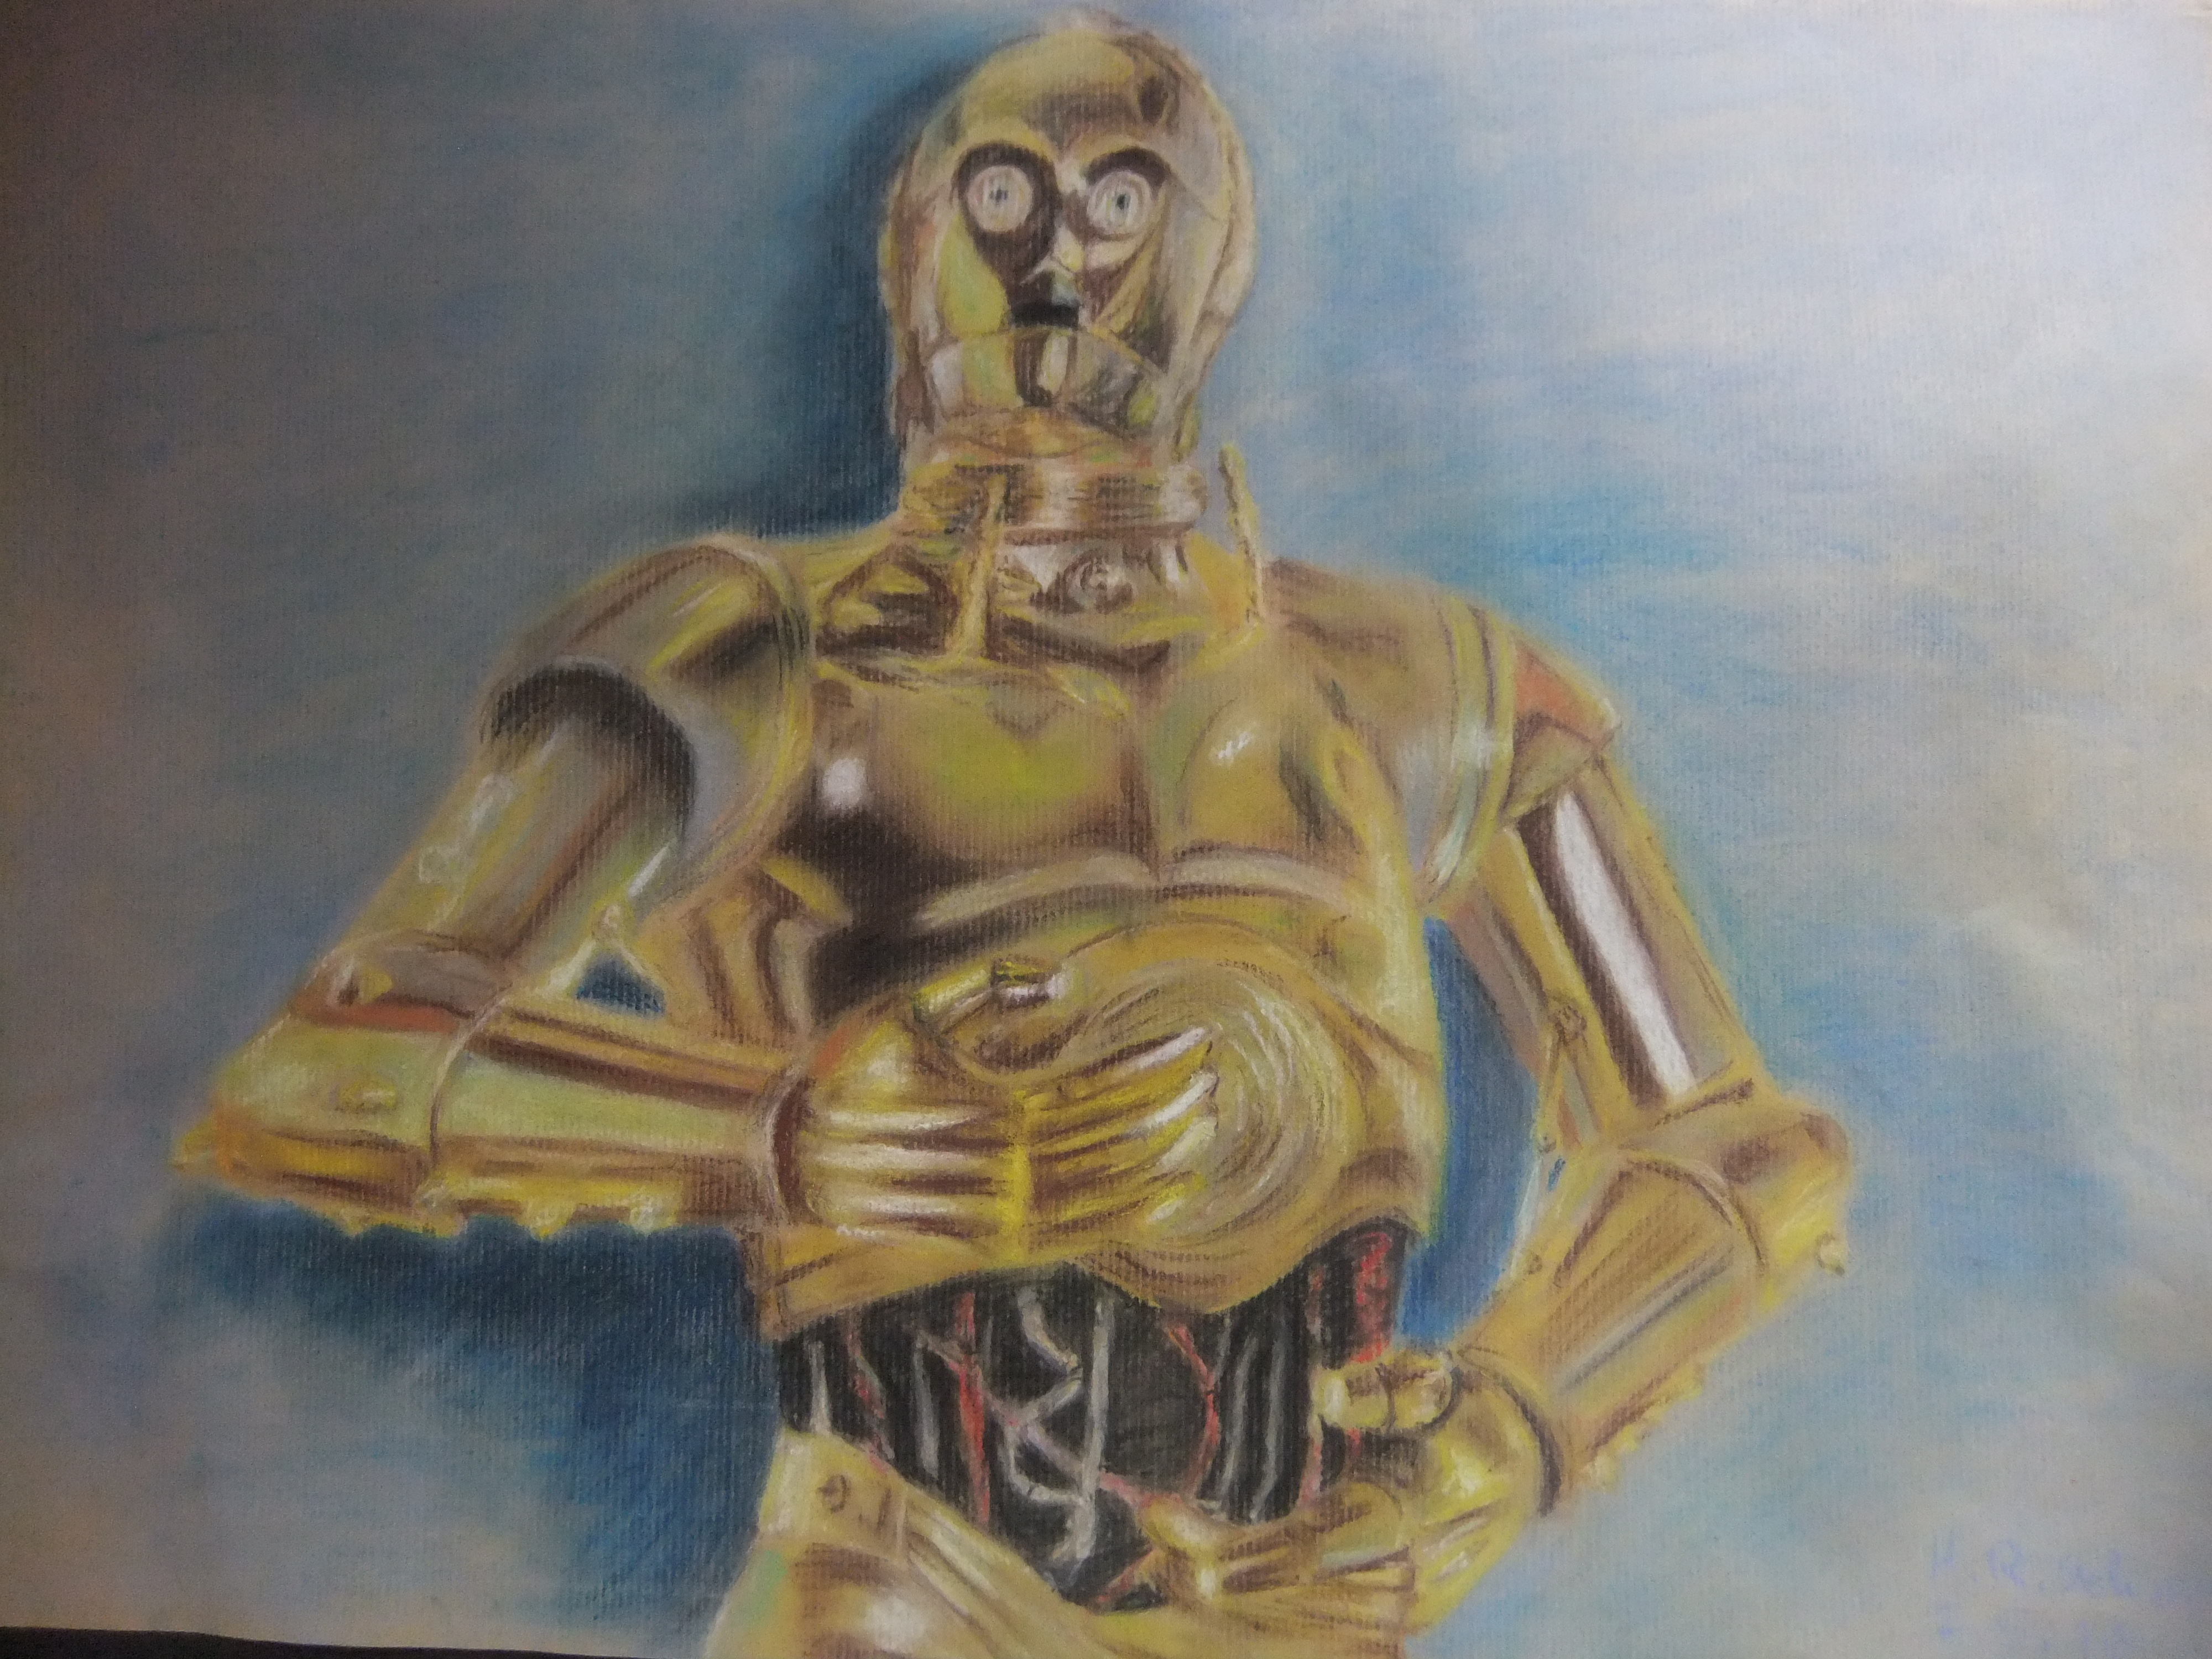 C-3PO pastel drawing